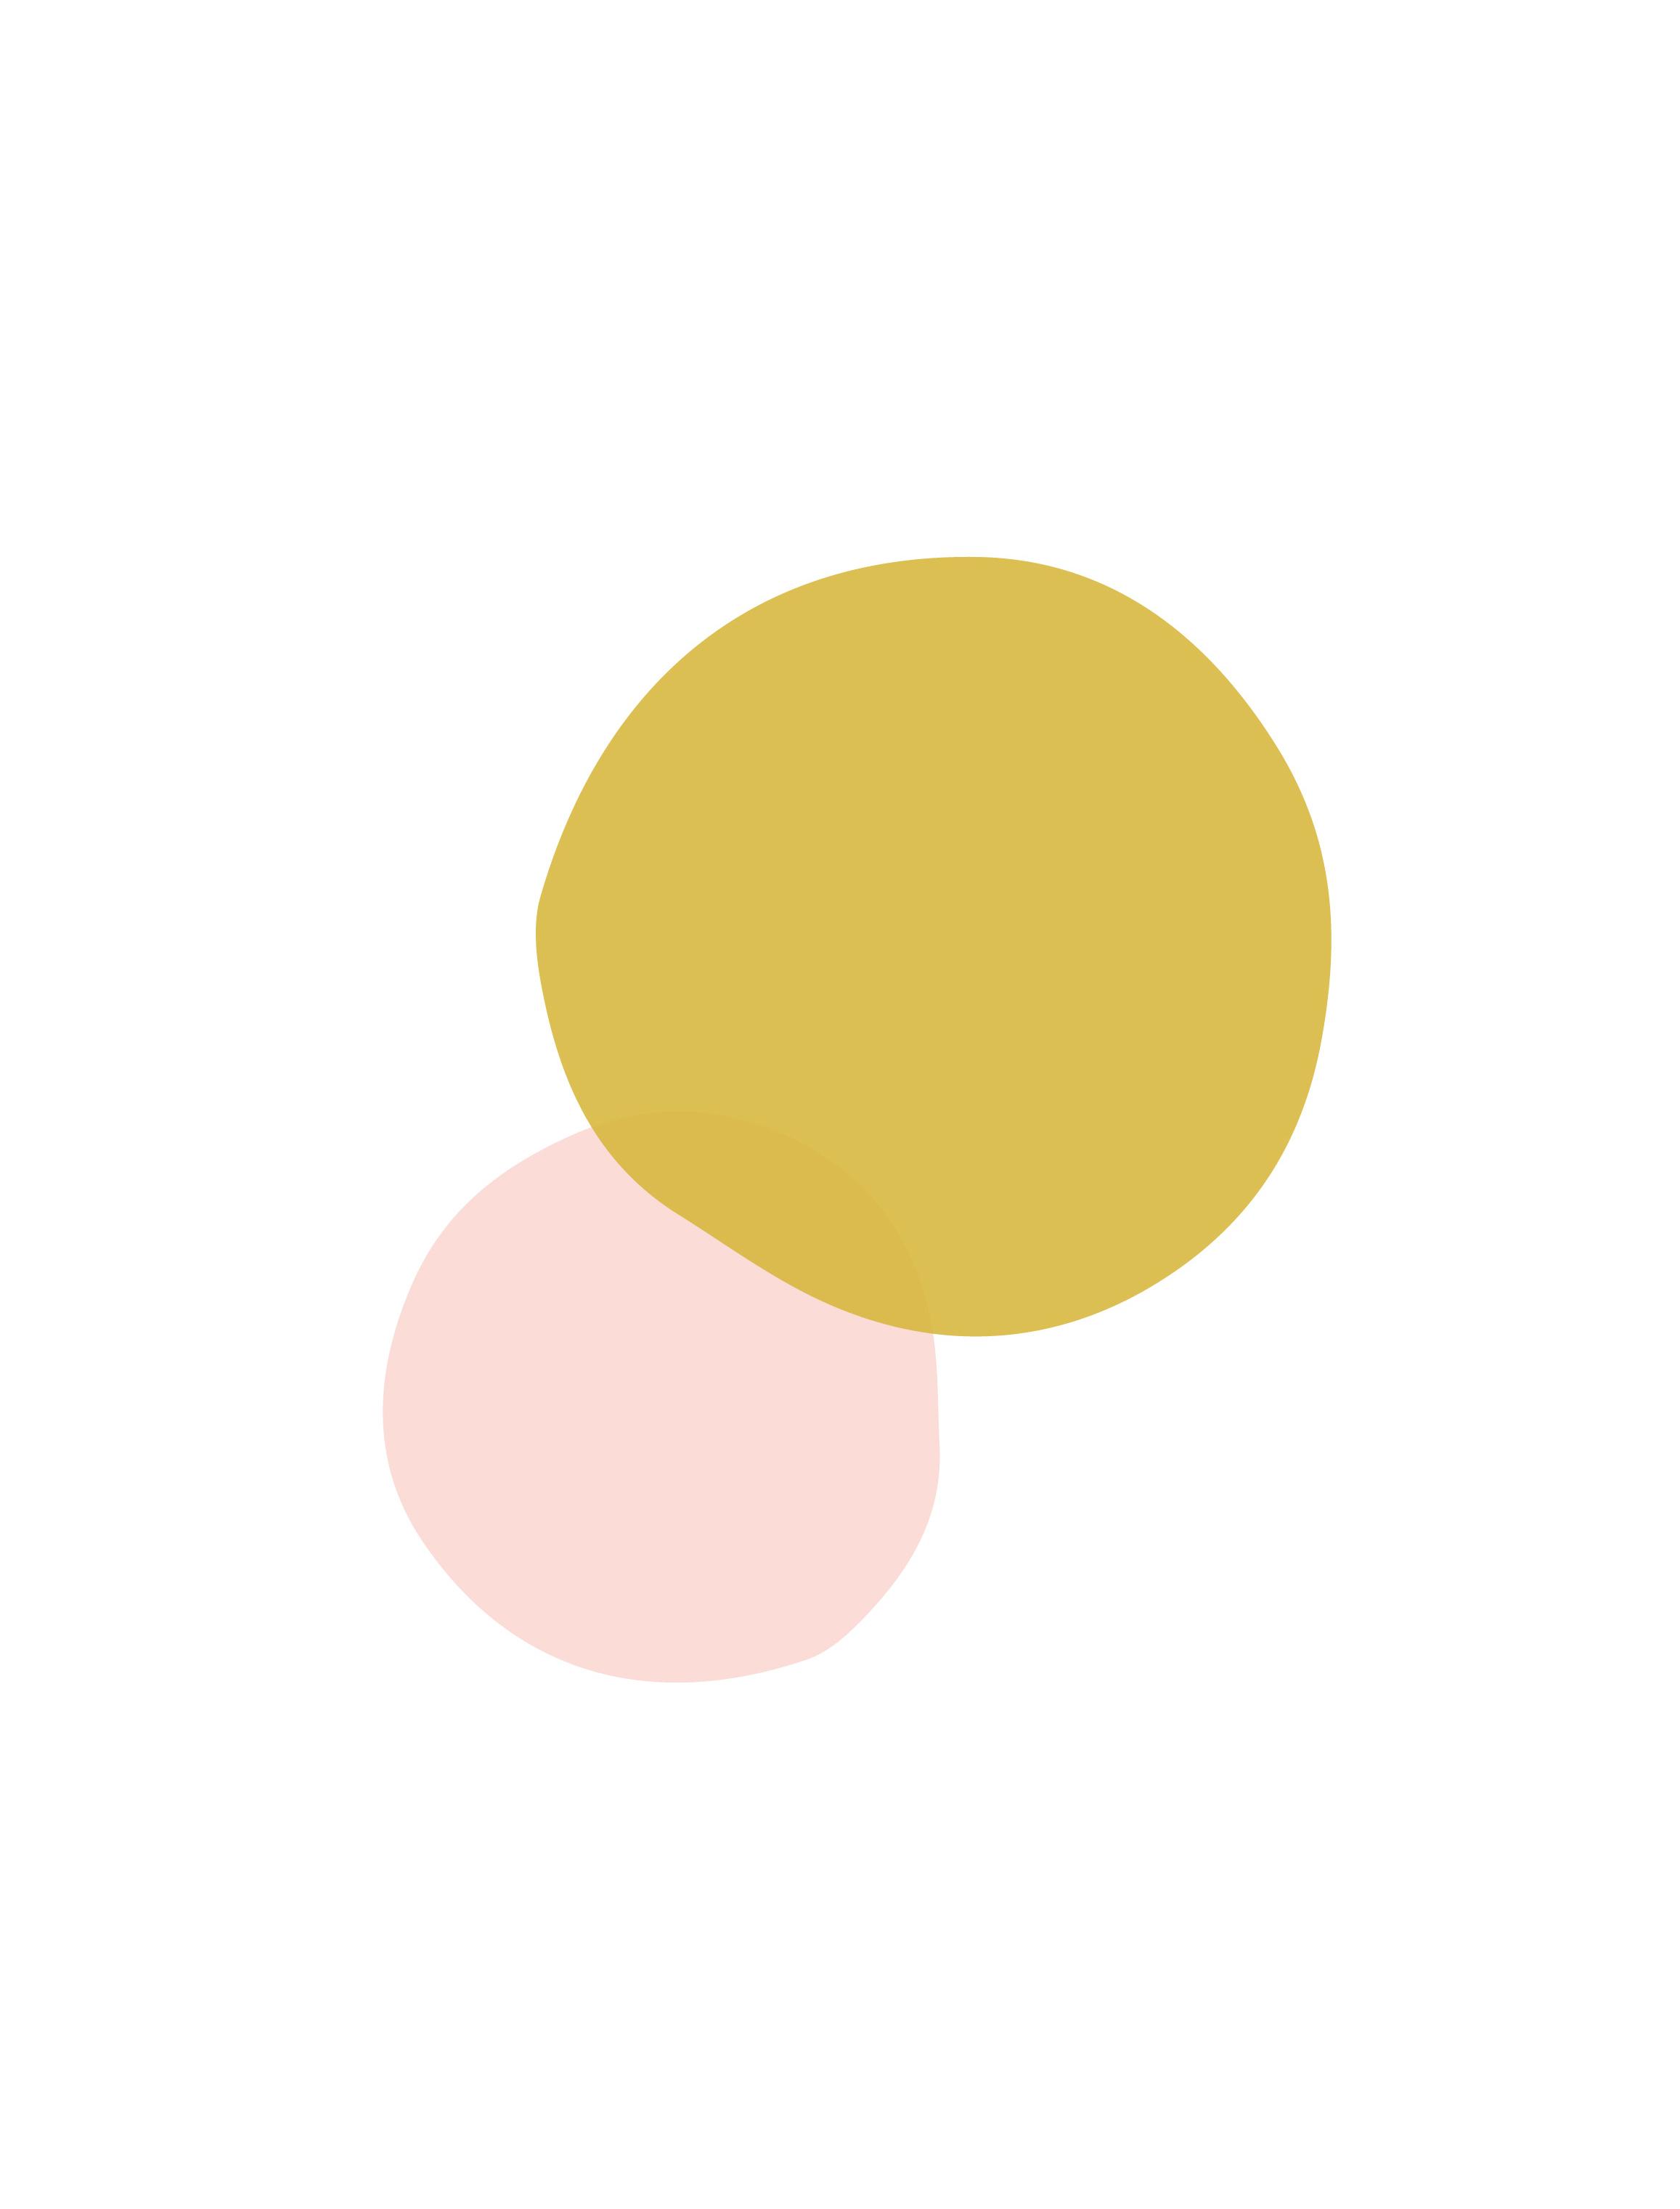 Circles-01.jpg